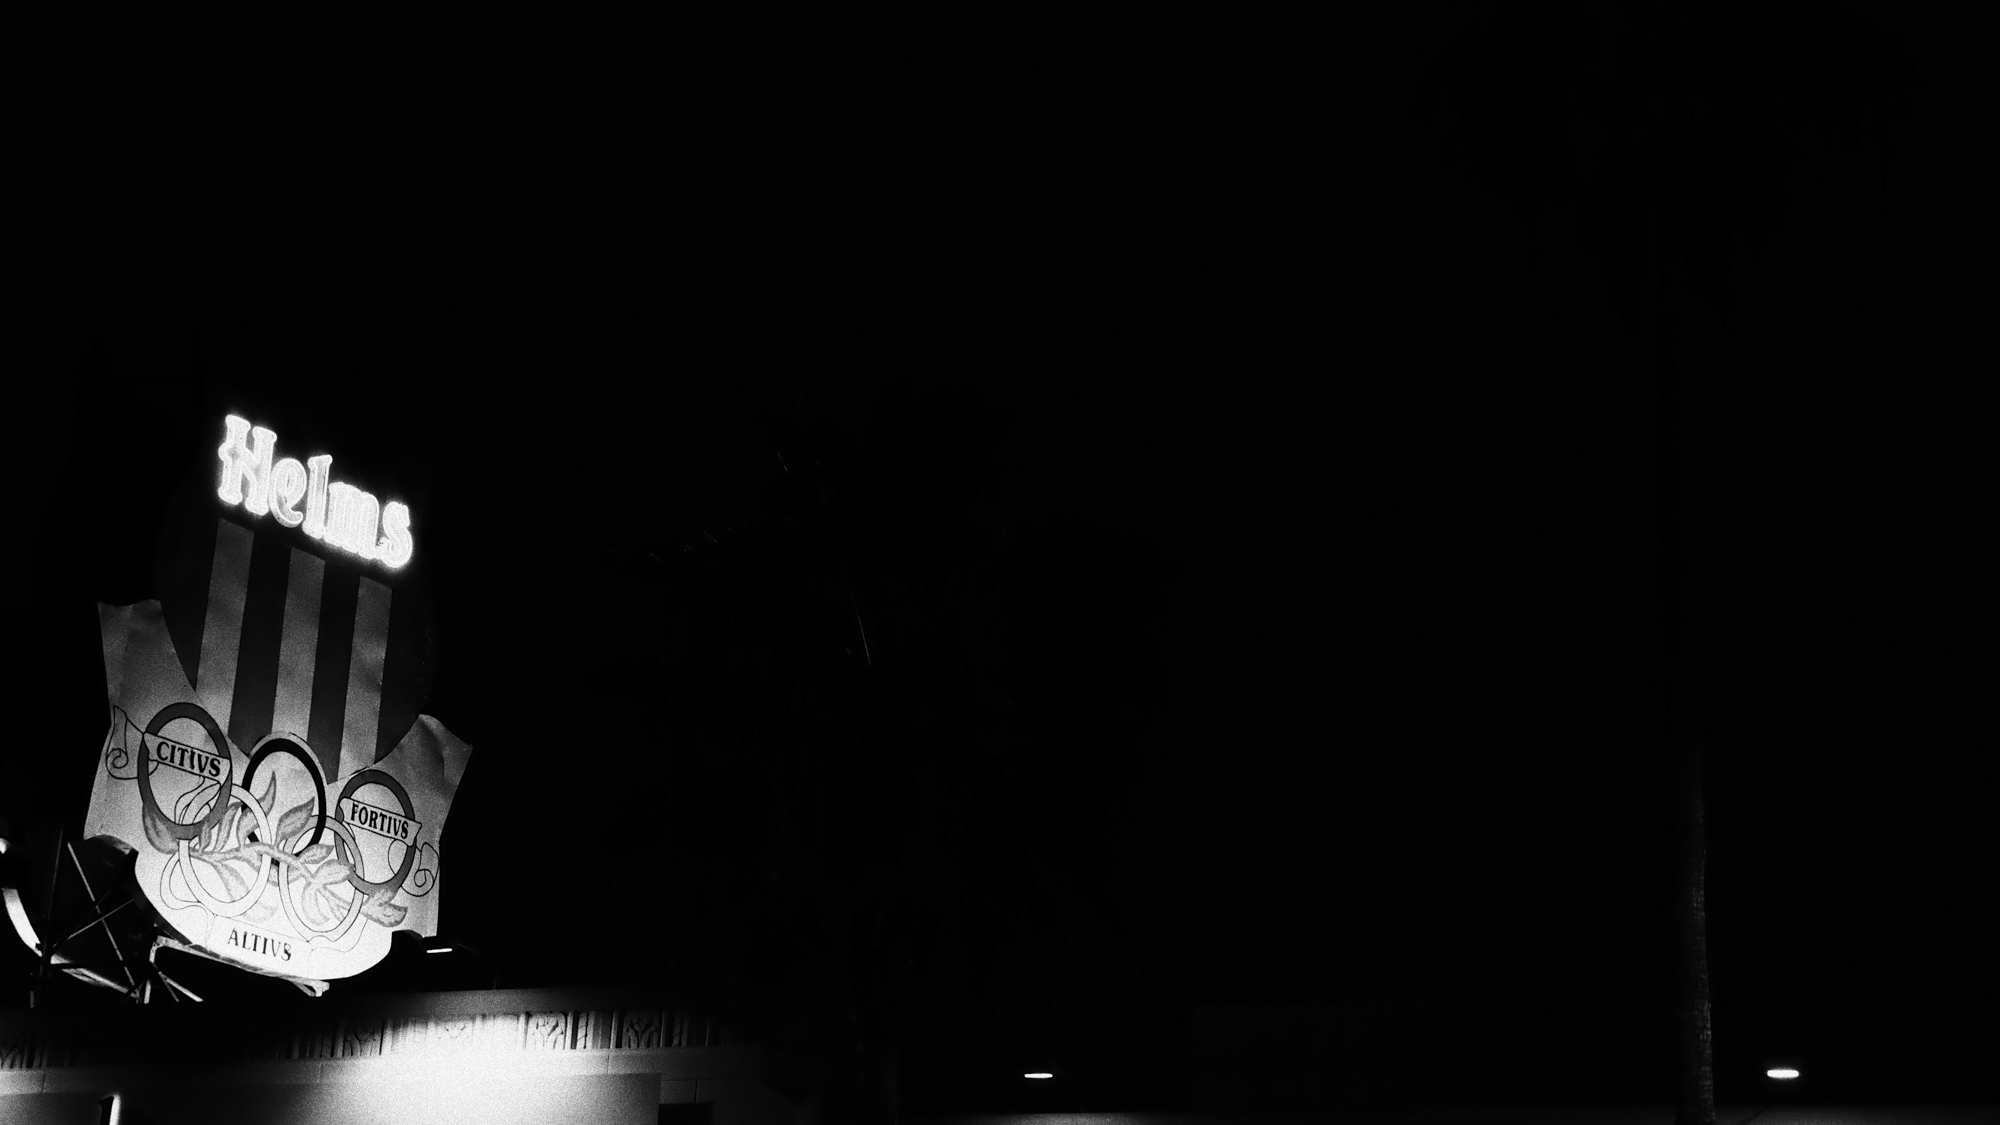 Helms at Night